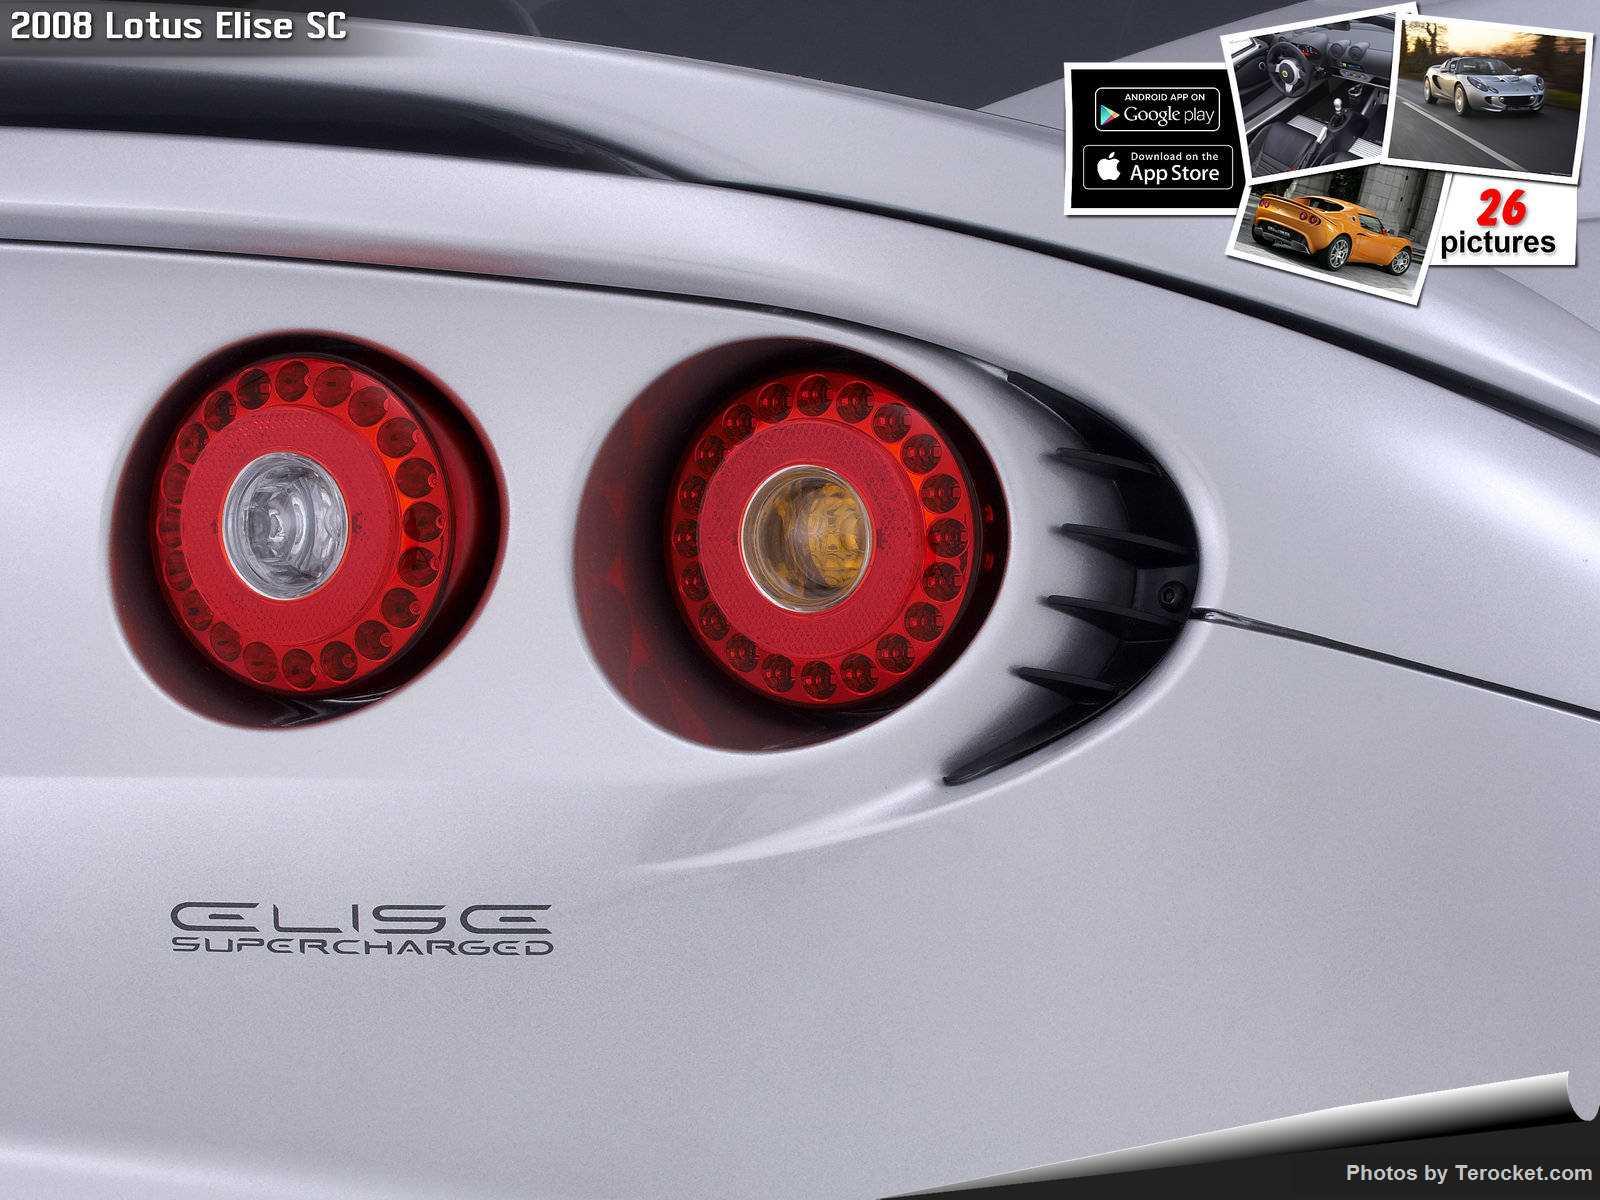 Hình ảnh siêu xe Lotus Elise SC 2008 & nội ngoại thất